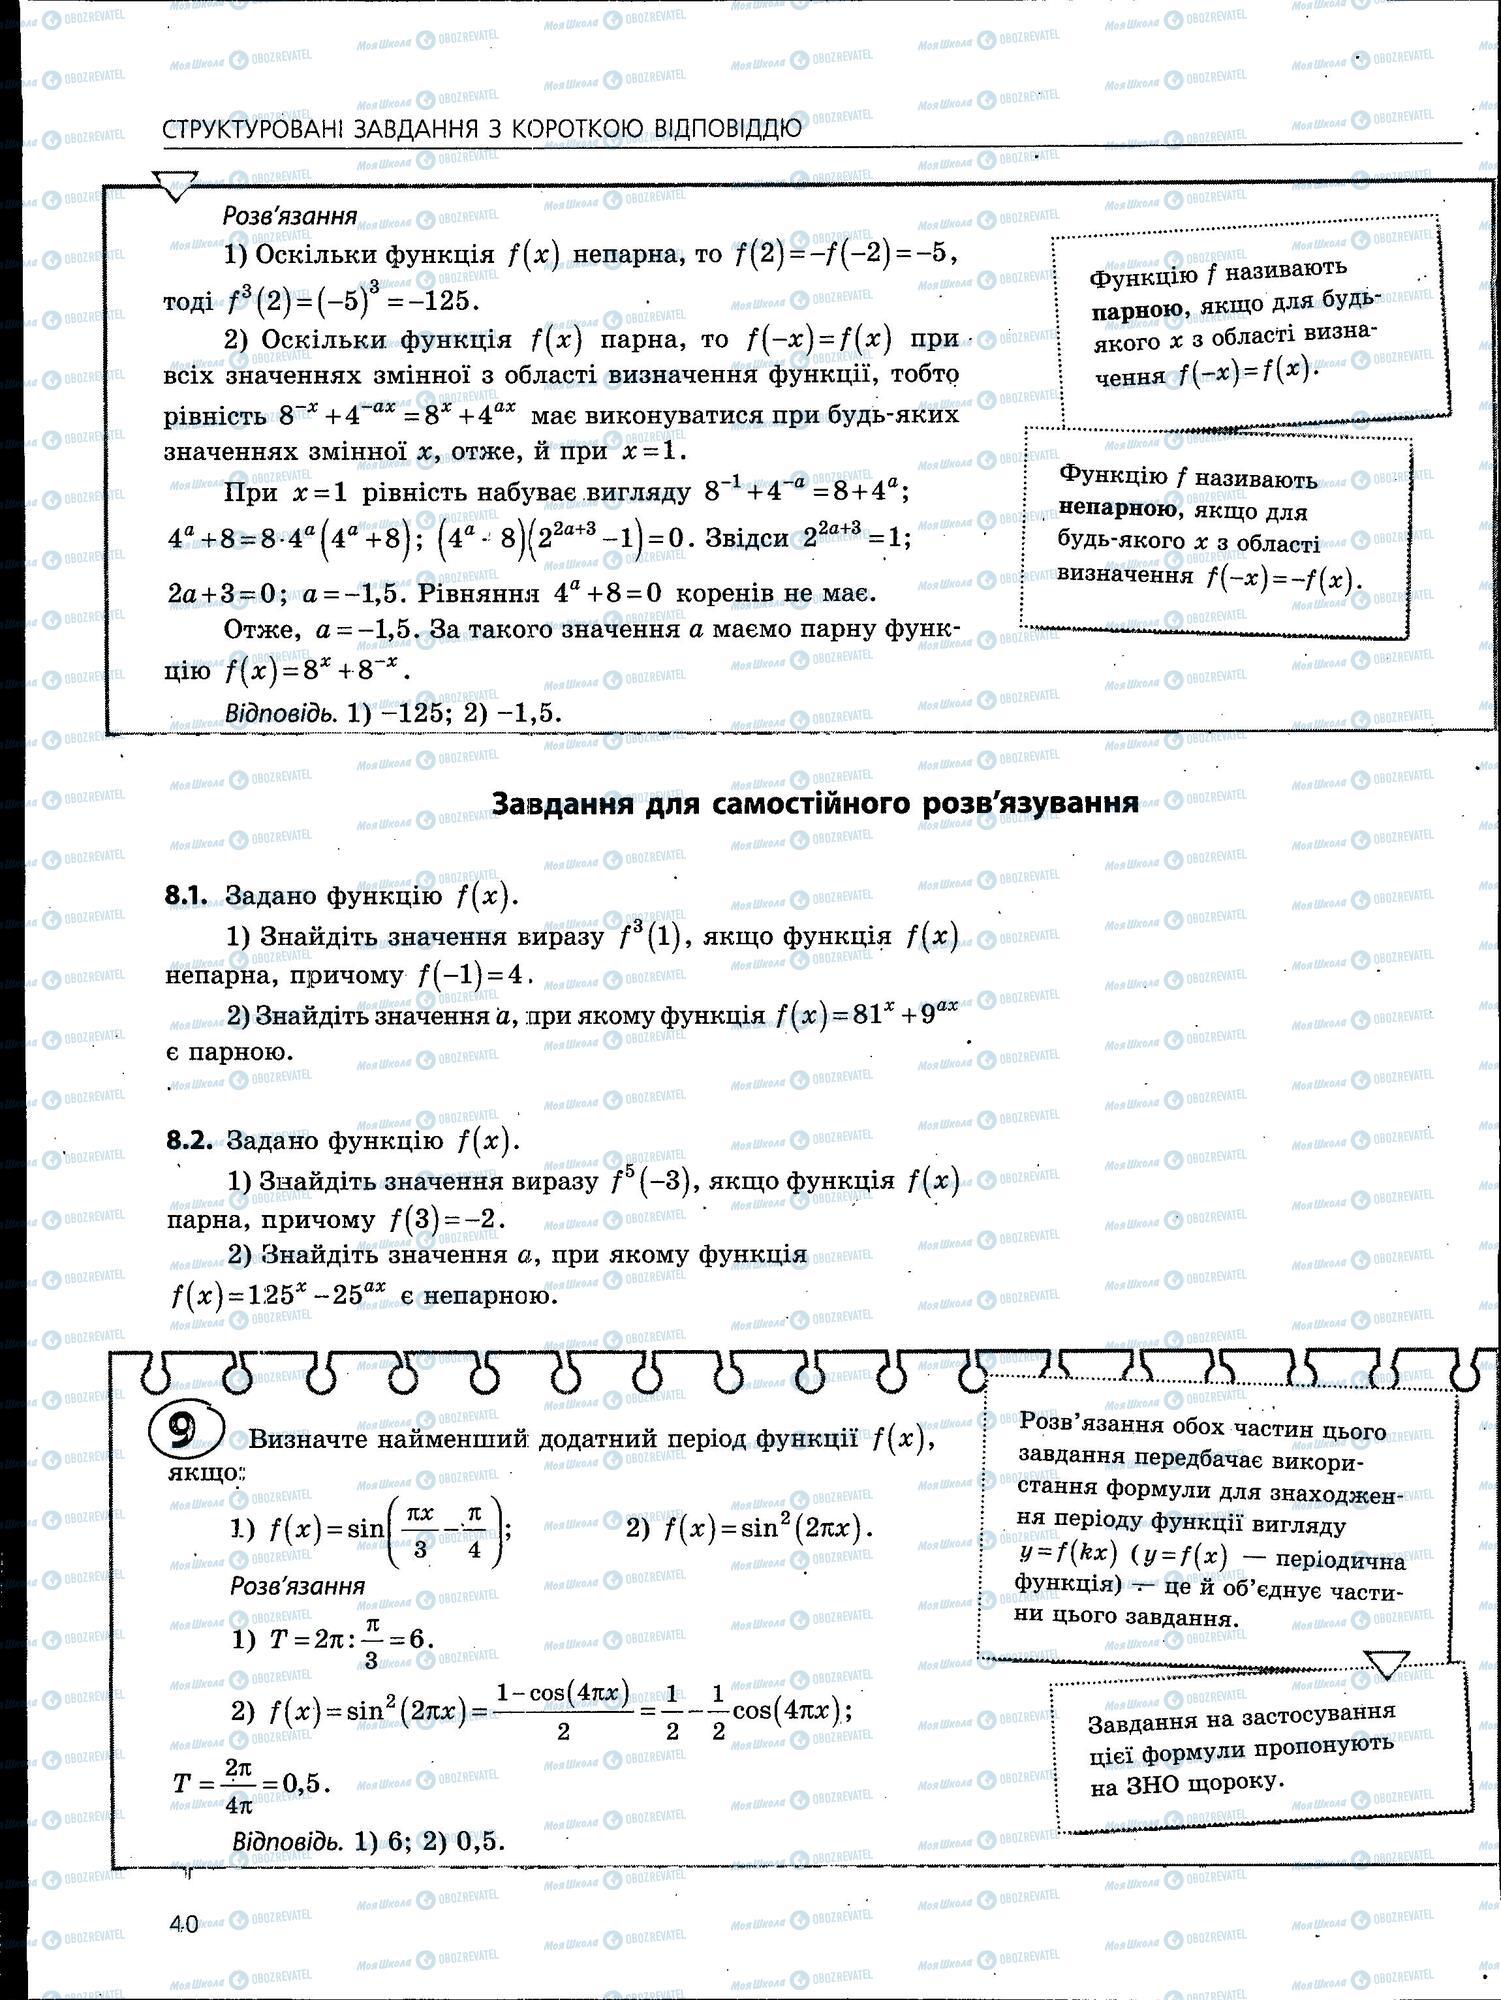 ЗНО Математика 11 класс страница 40